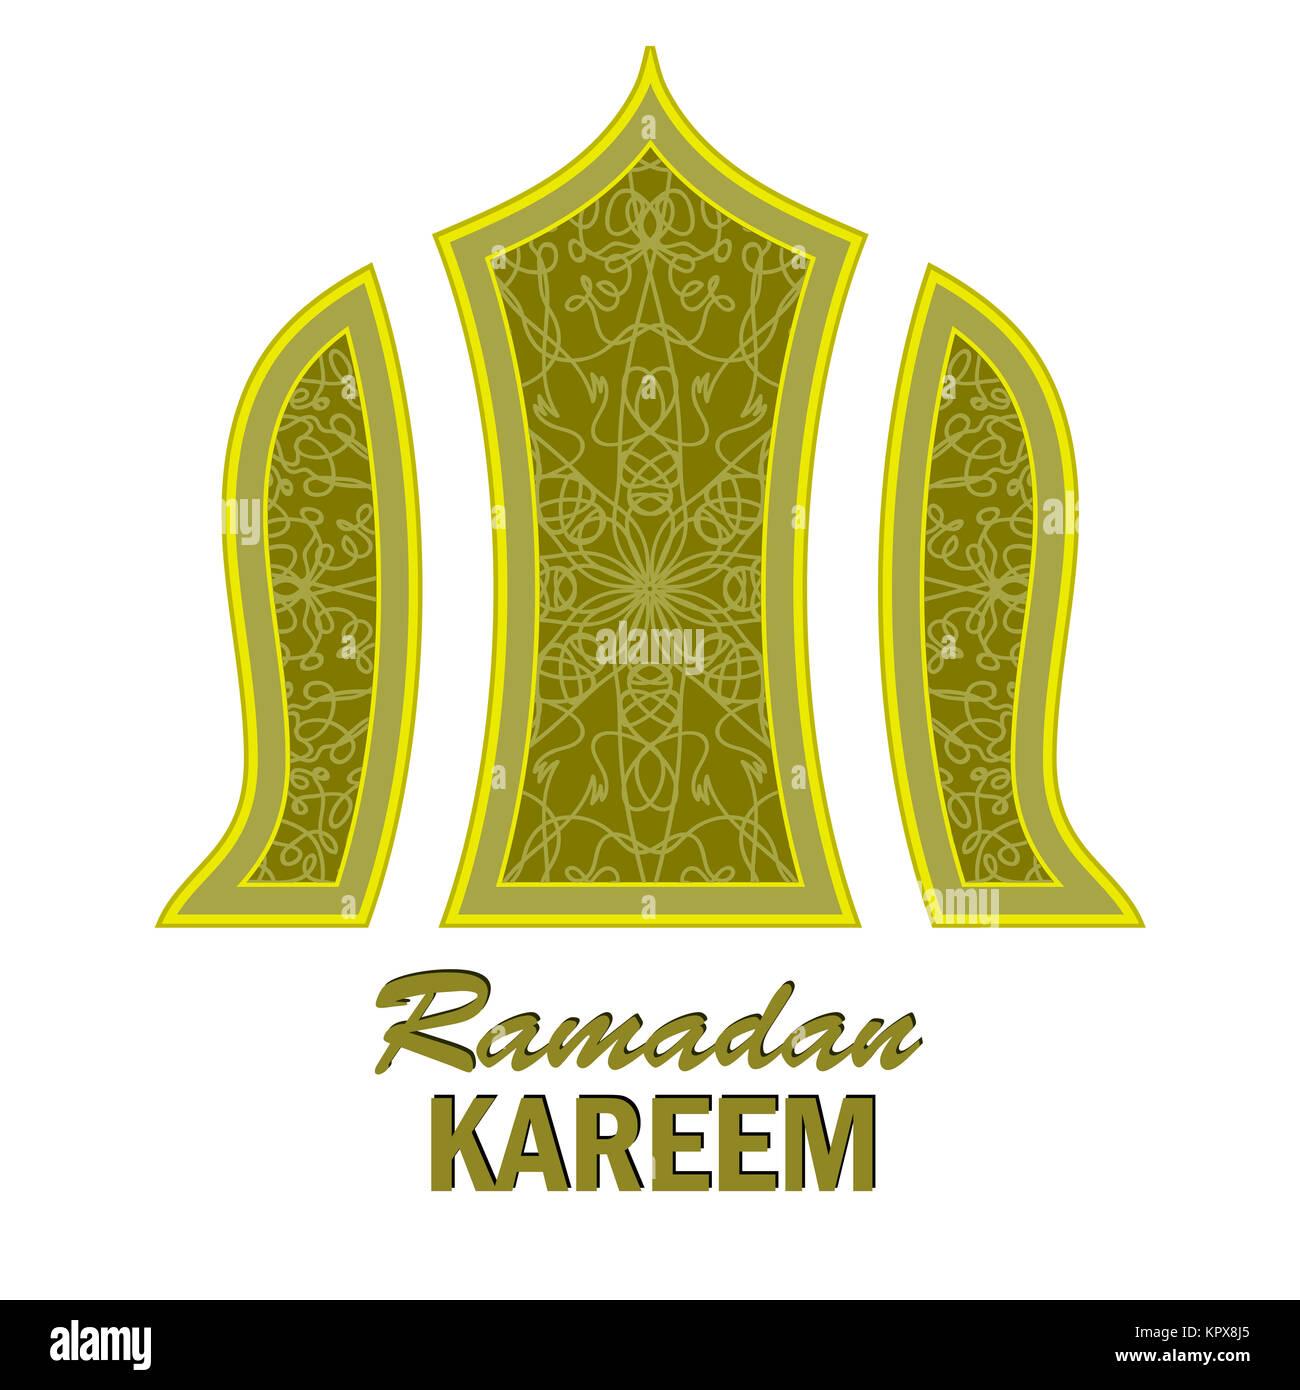 Ramadan greeting stock photos ramadan greeting stock images alamy ramadan greeting card stock image kristyandbryce Image collections